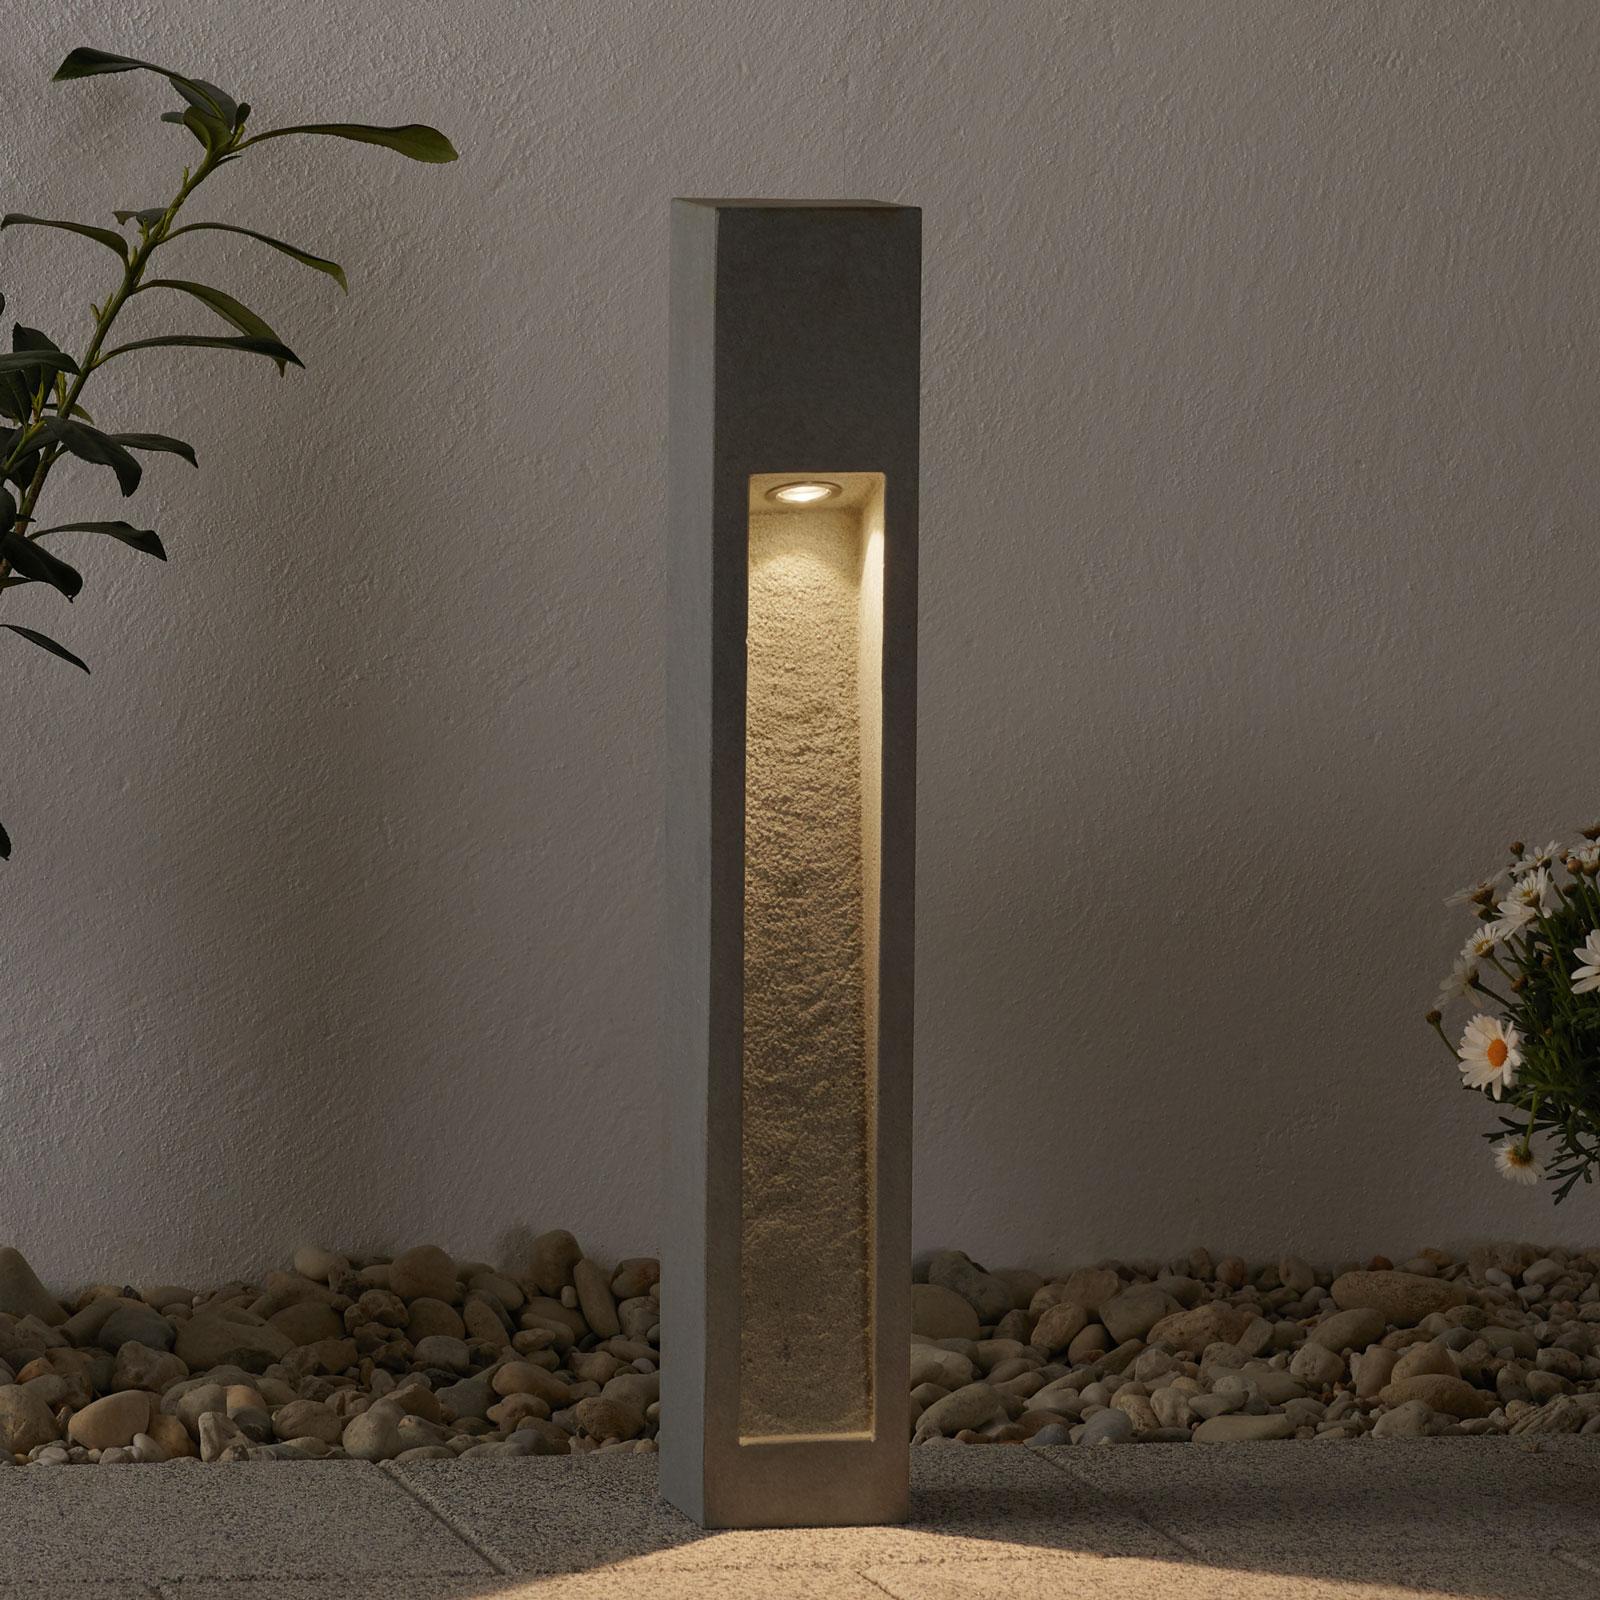 Acquista Robusto lampioncino LED Arrock Stone